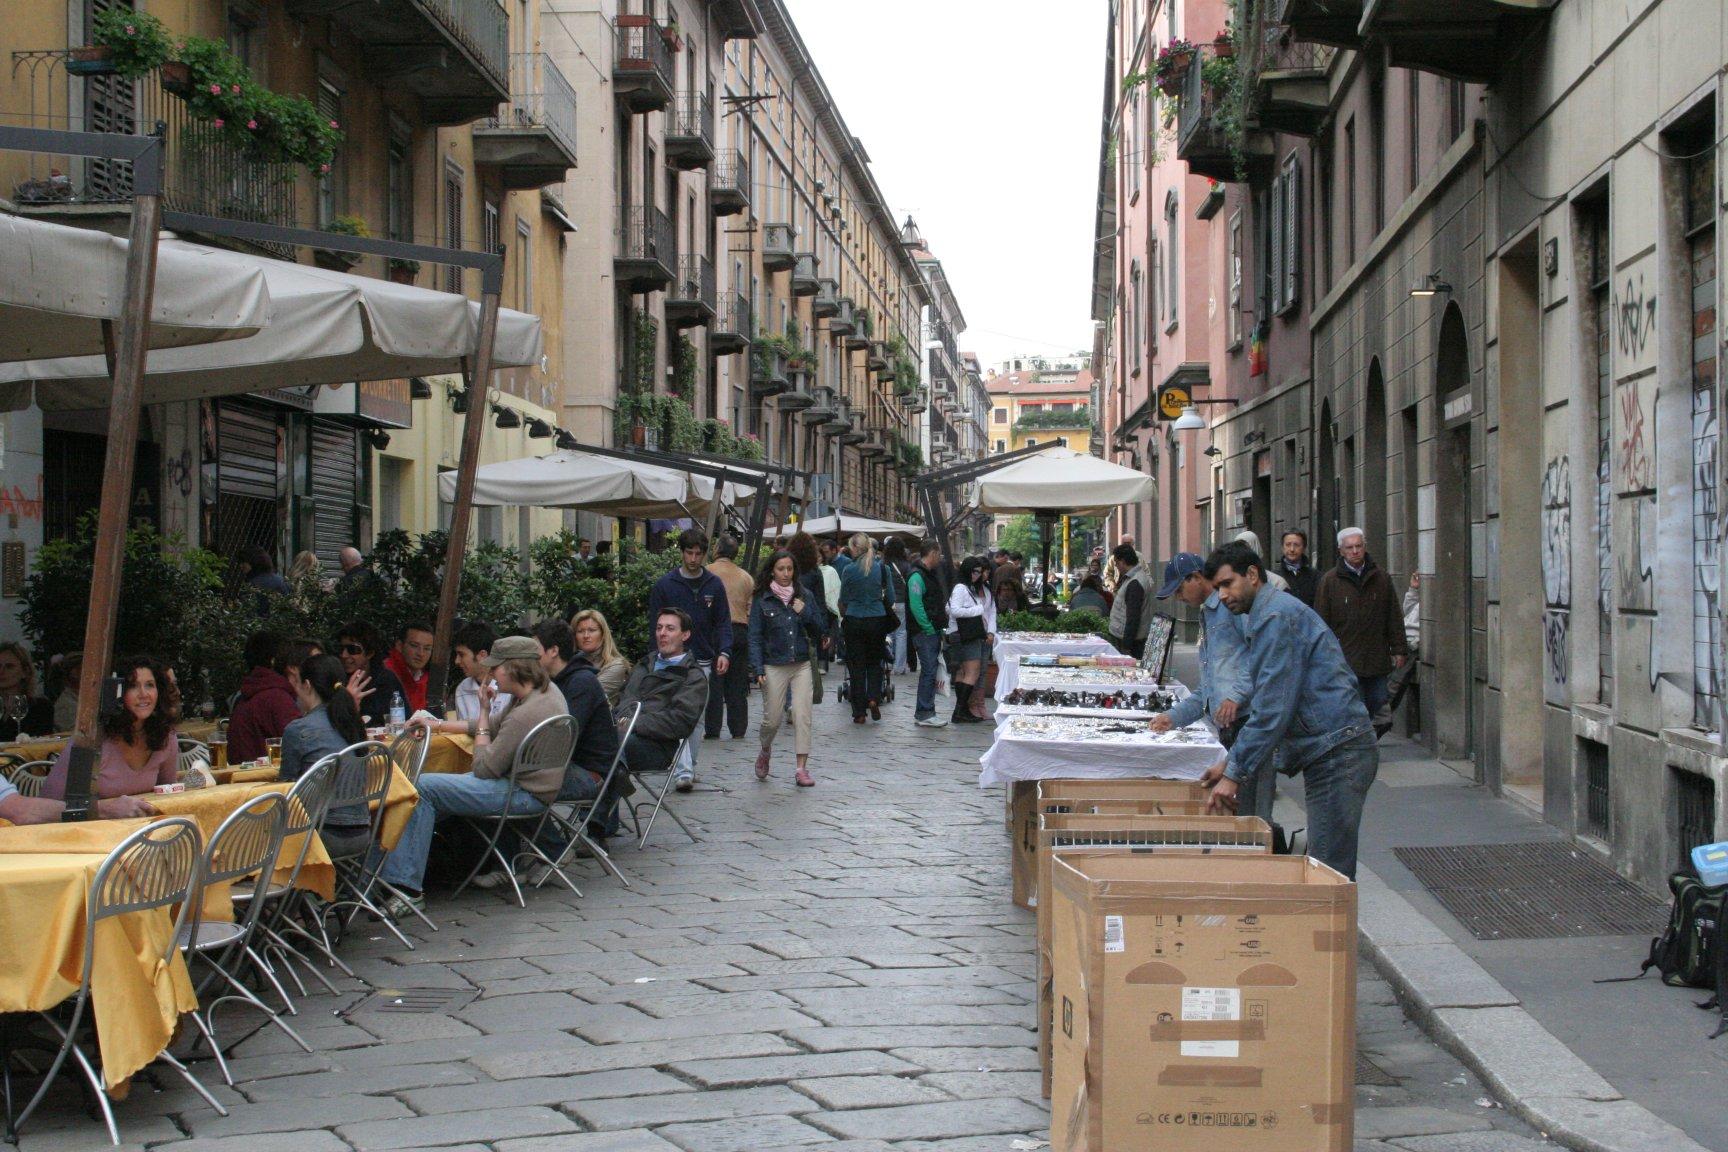 Улица Брера в Милане